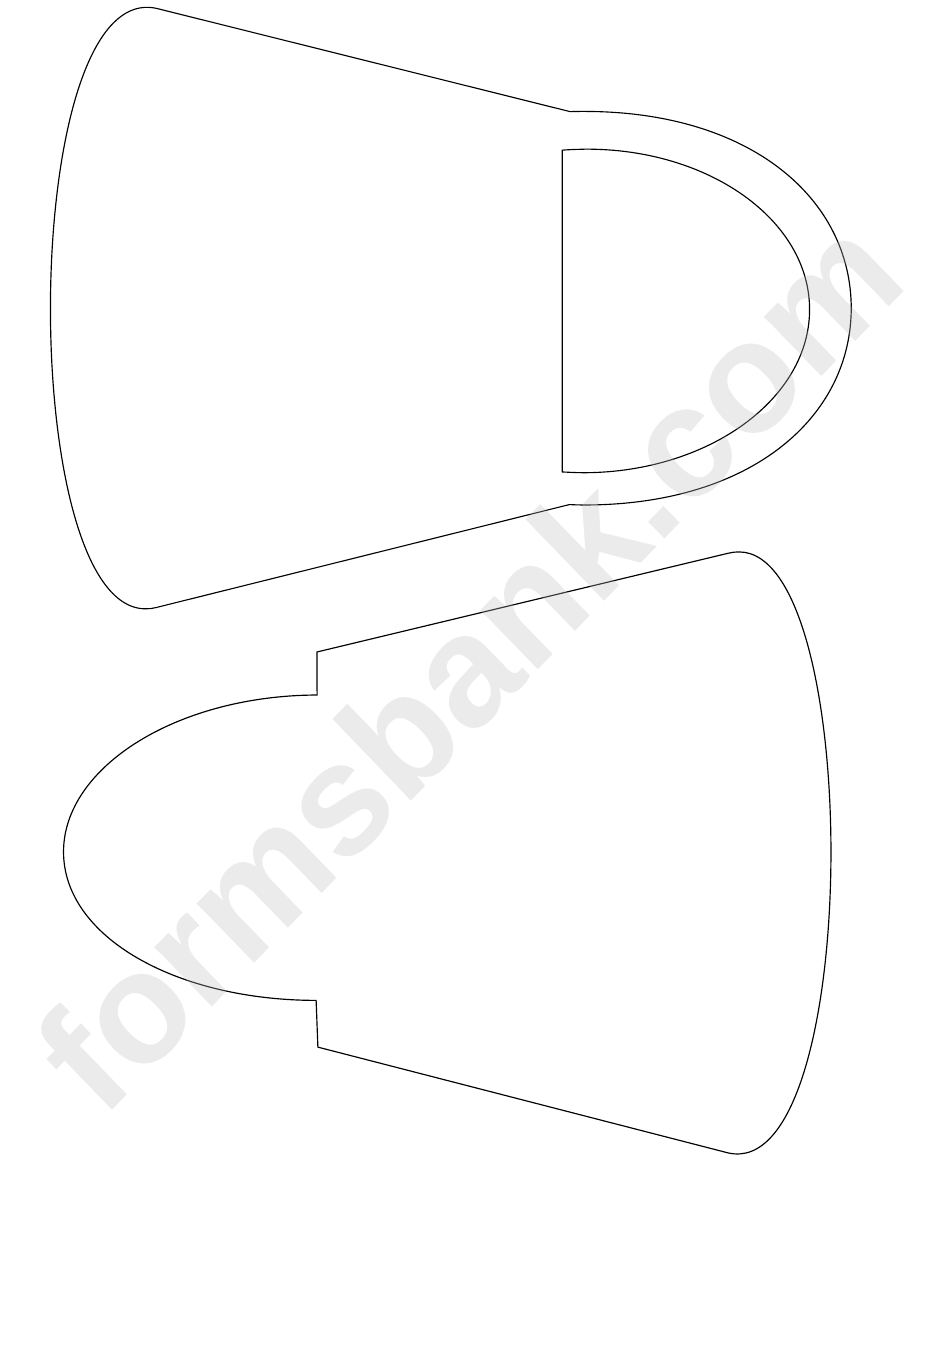 Paper Purse Template printable pdf download